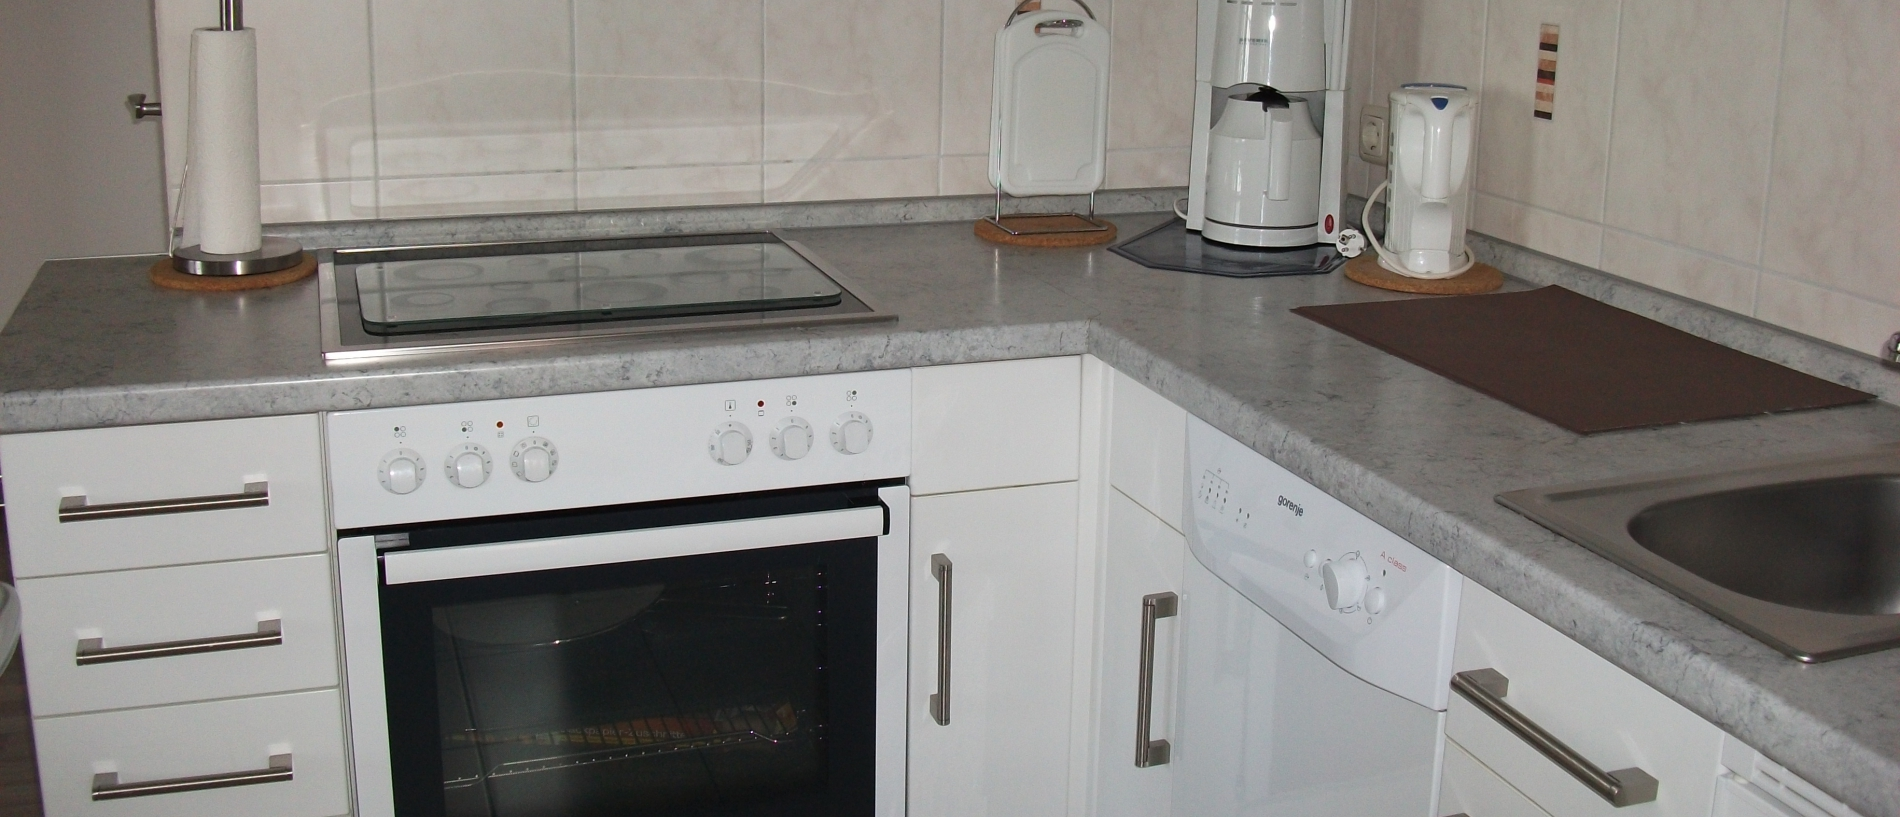 FeWo-Seestern-Küche-1-1-e1472556437314